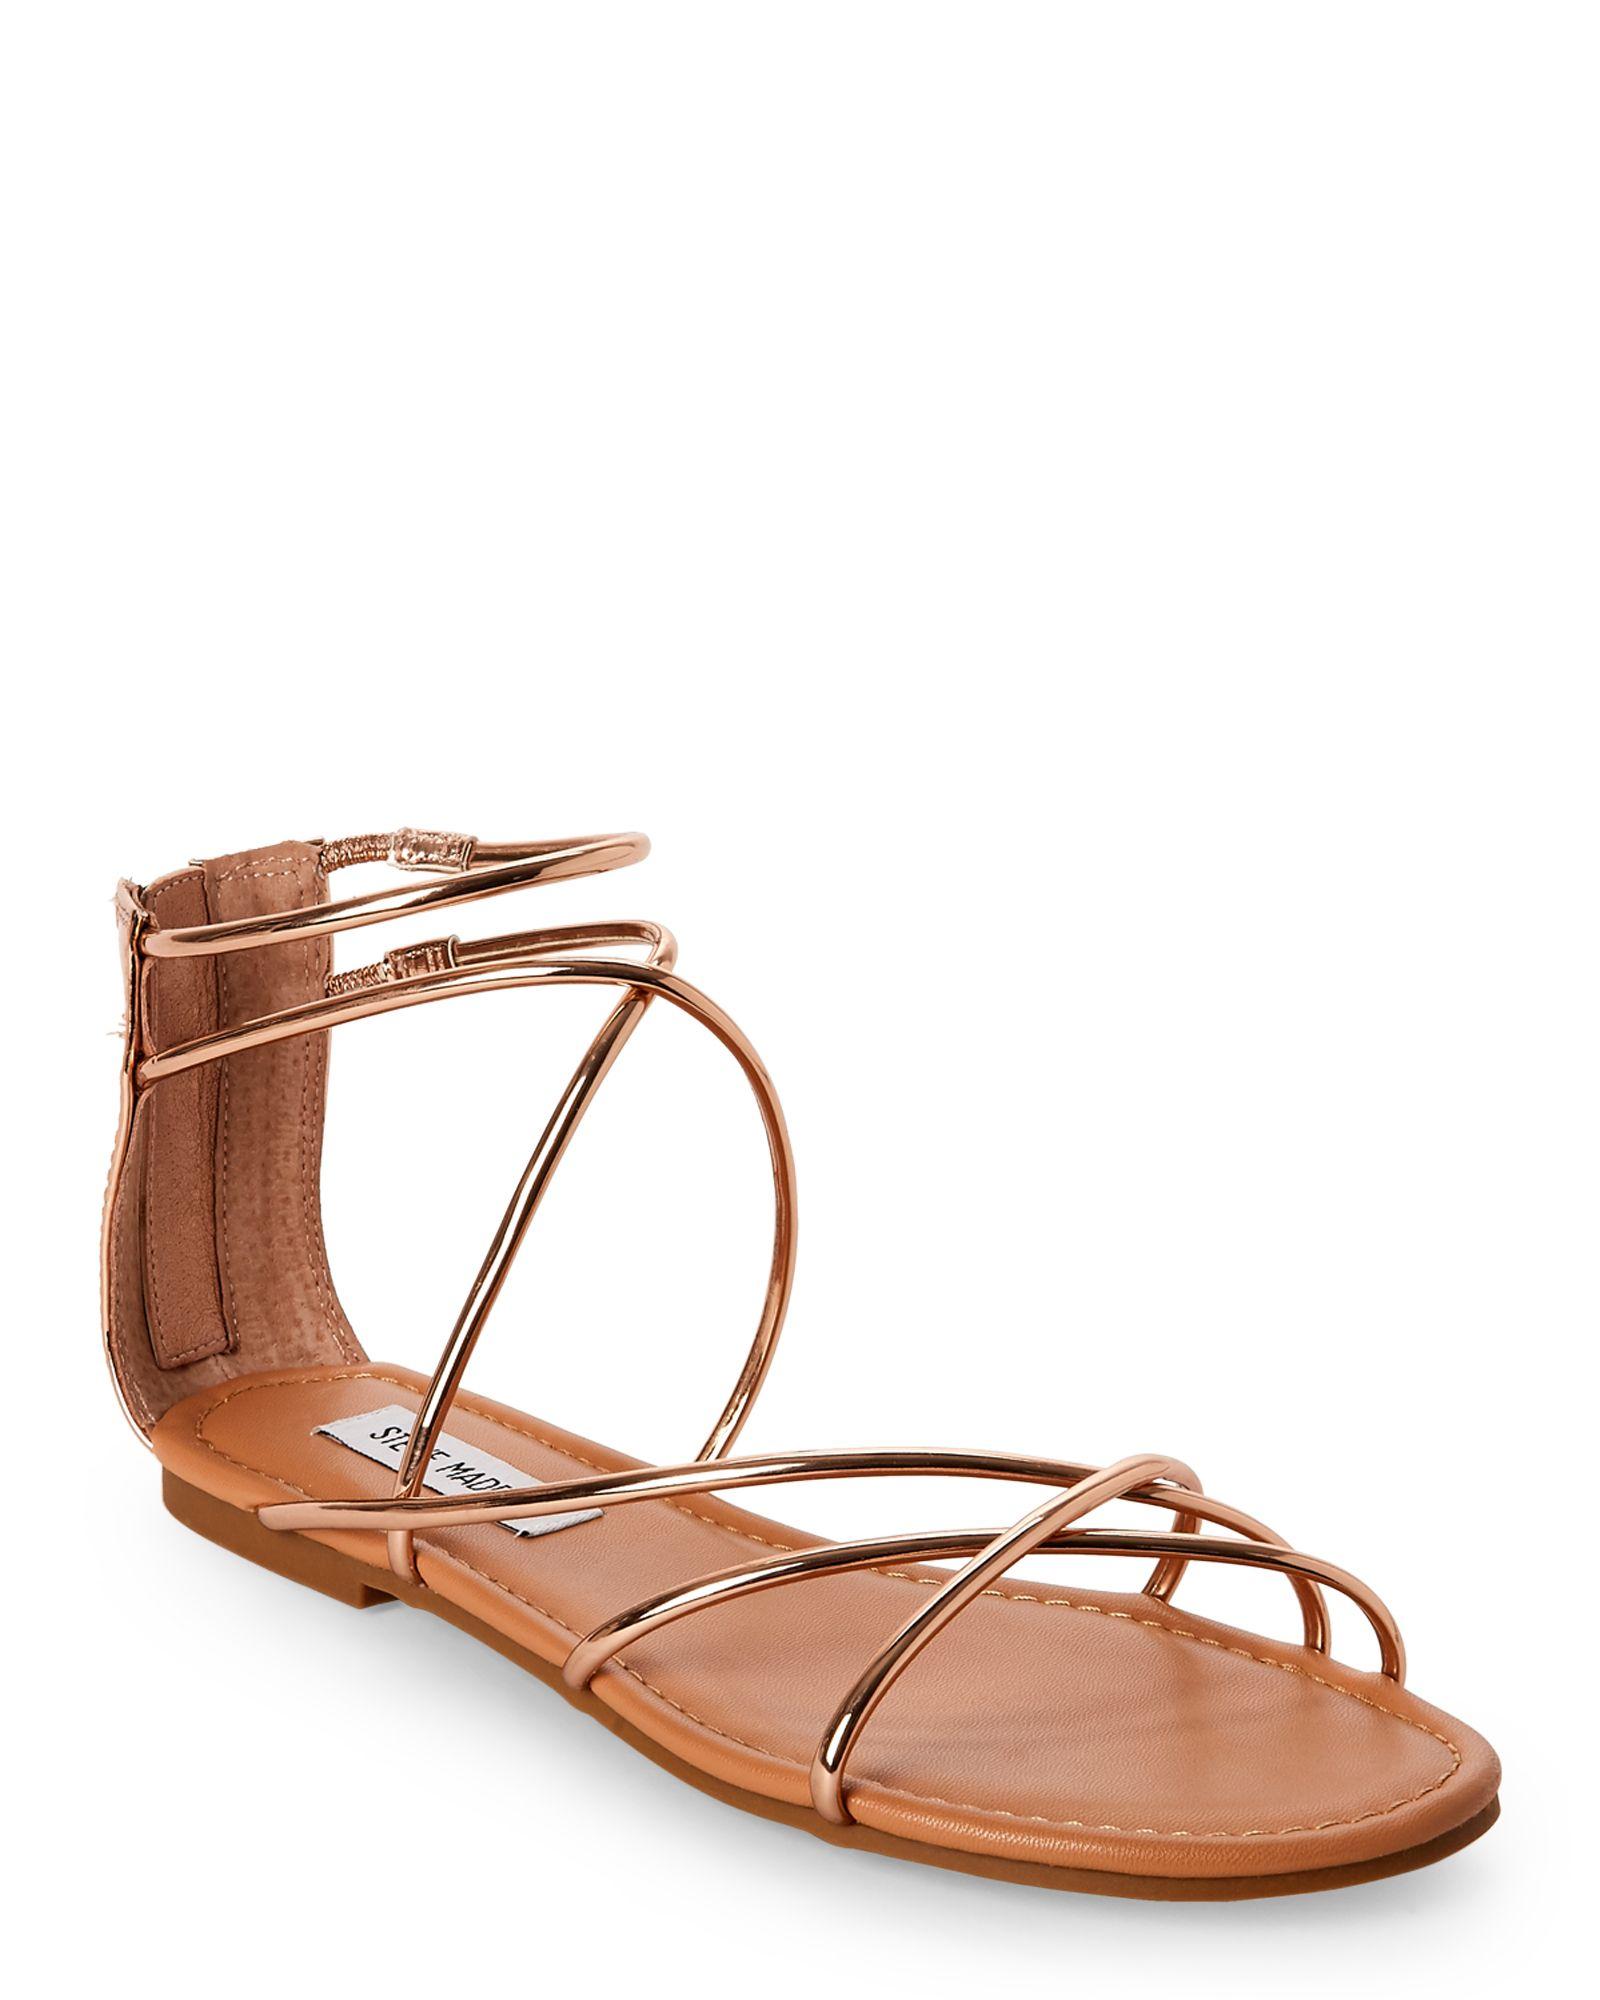 d5f67ed02ff Steve Madden Rose Gold Sapphire Strappy Flat Sandals | *Apparel ...